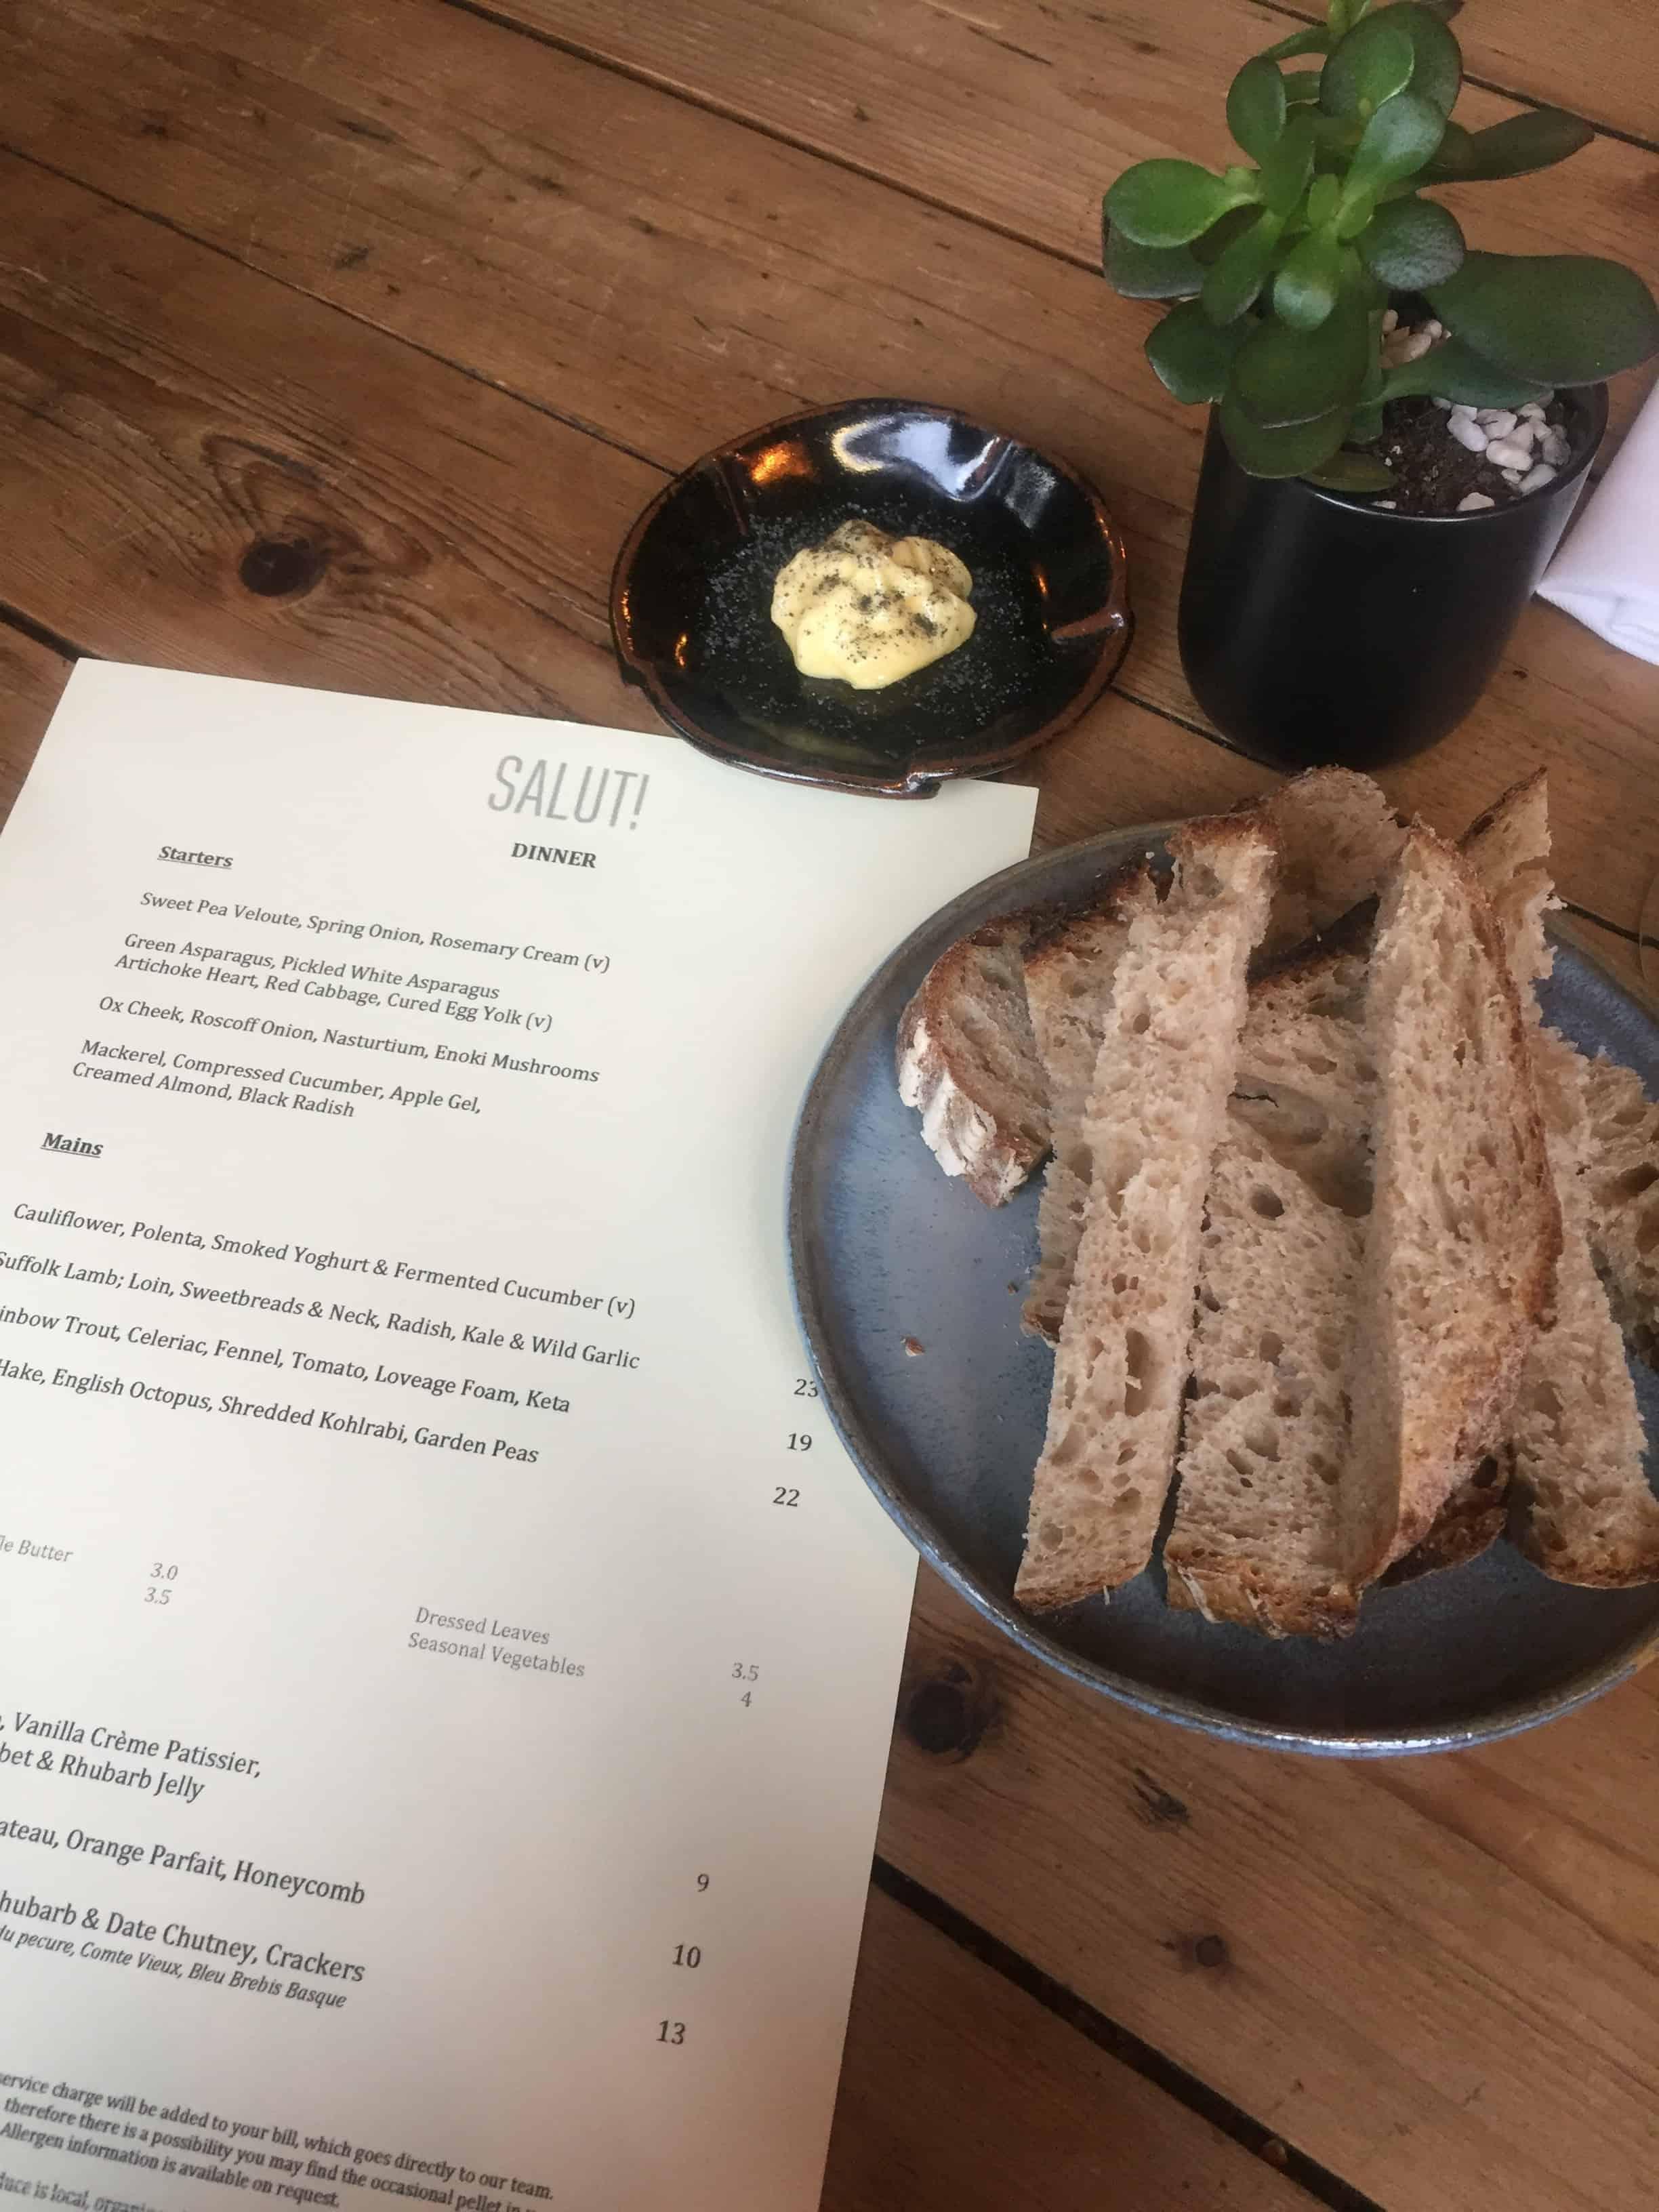 Salut Restaurant in Islington